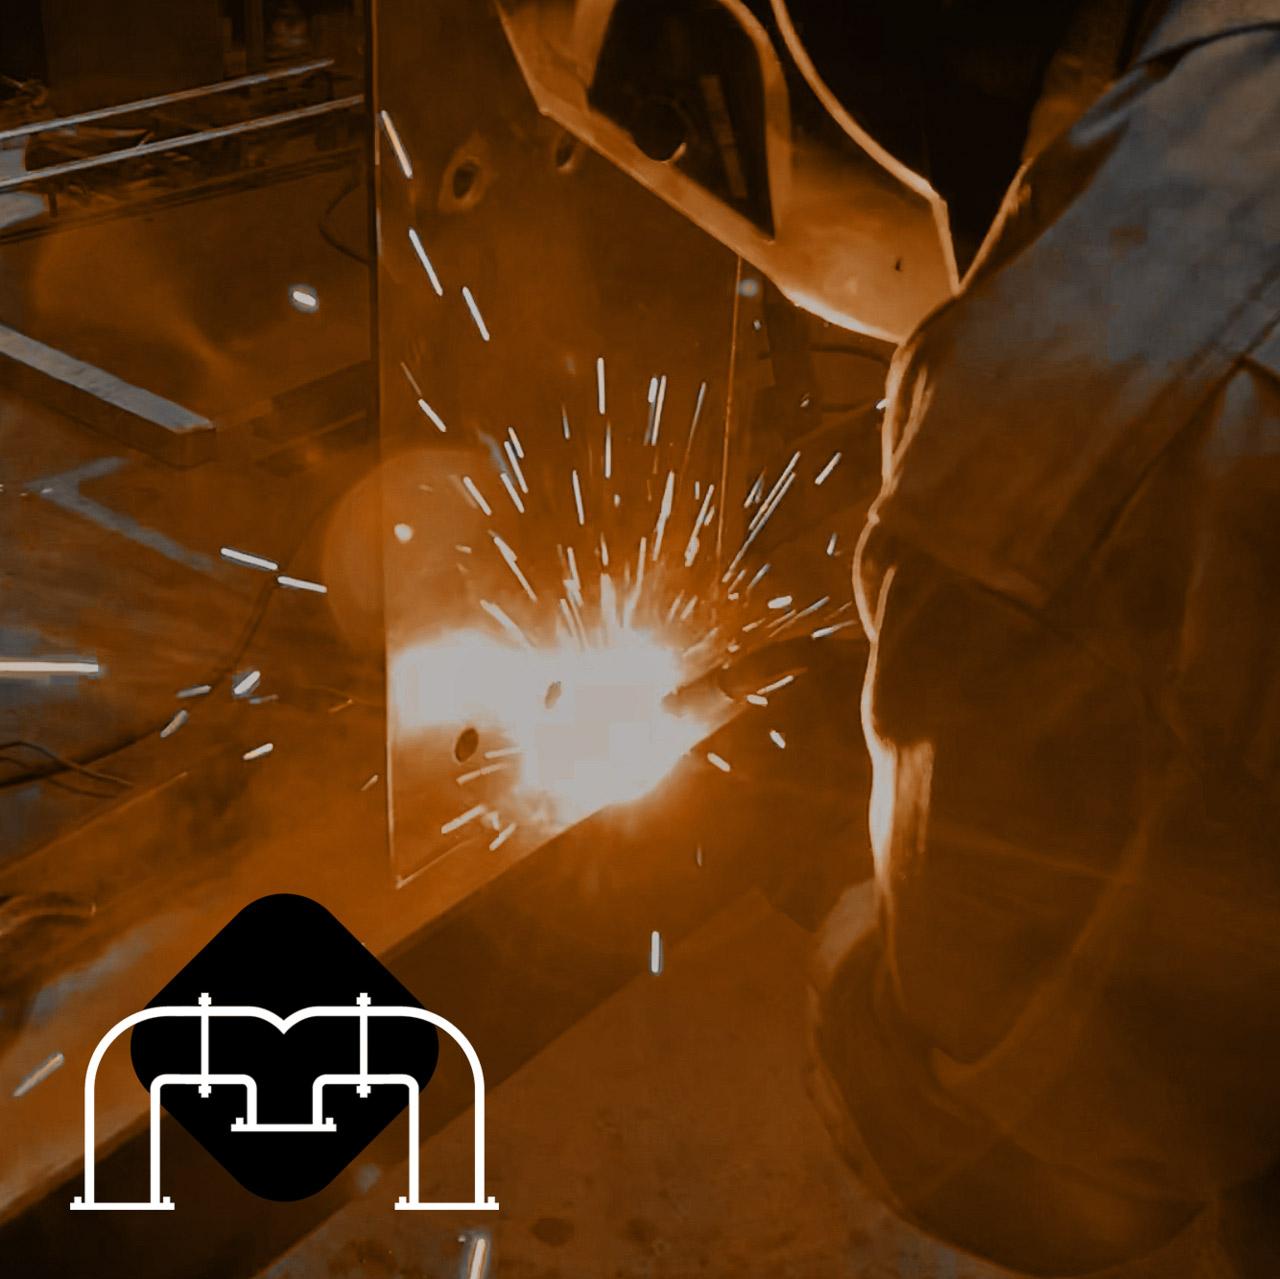 Industrial Fabrication - Welding